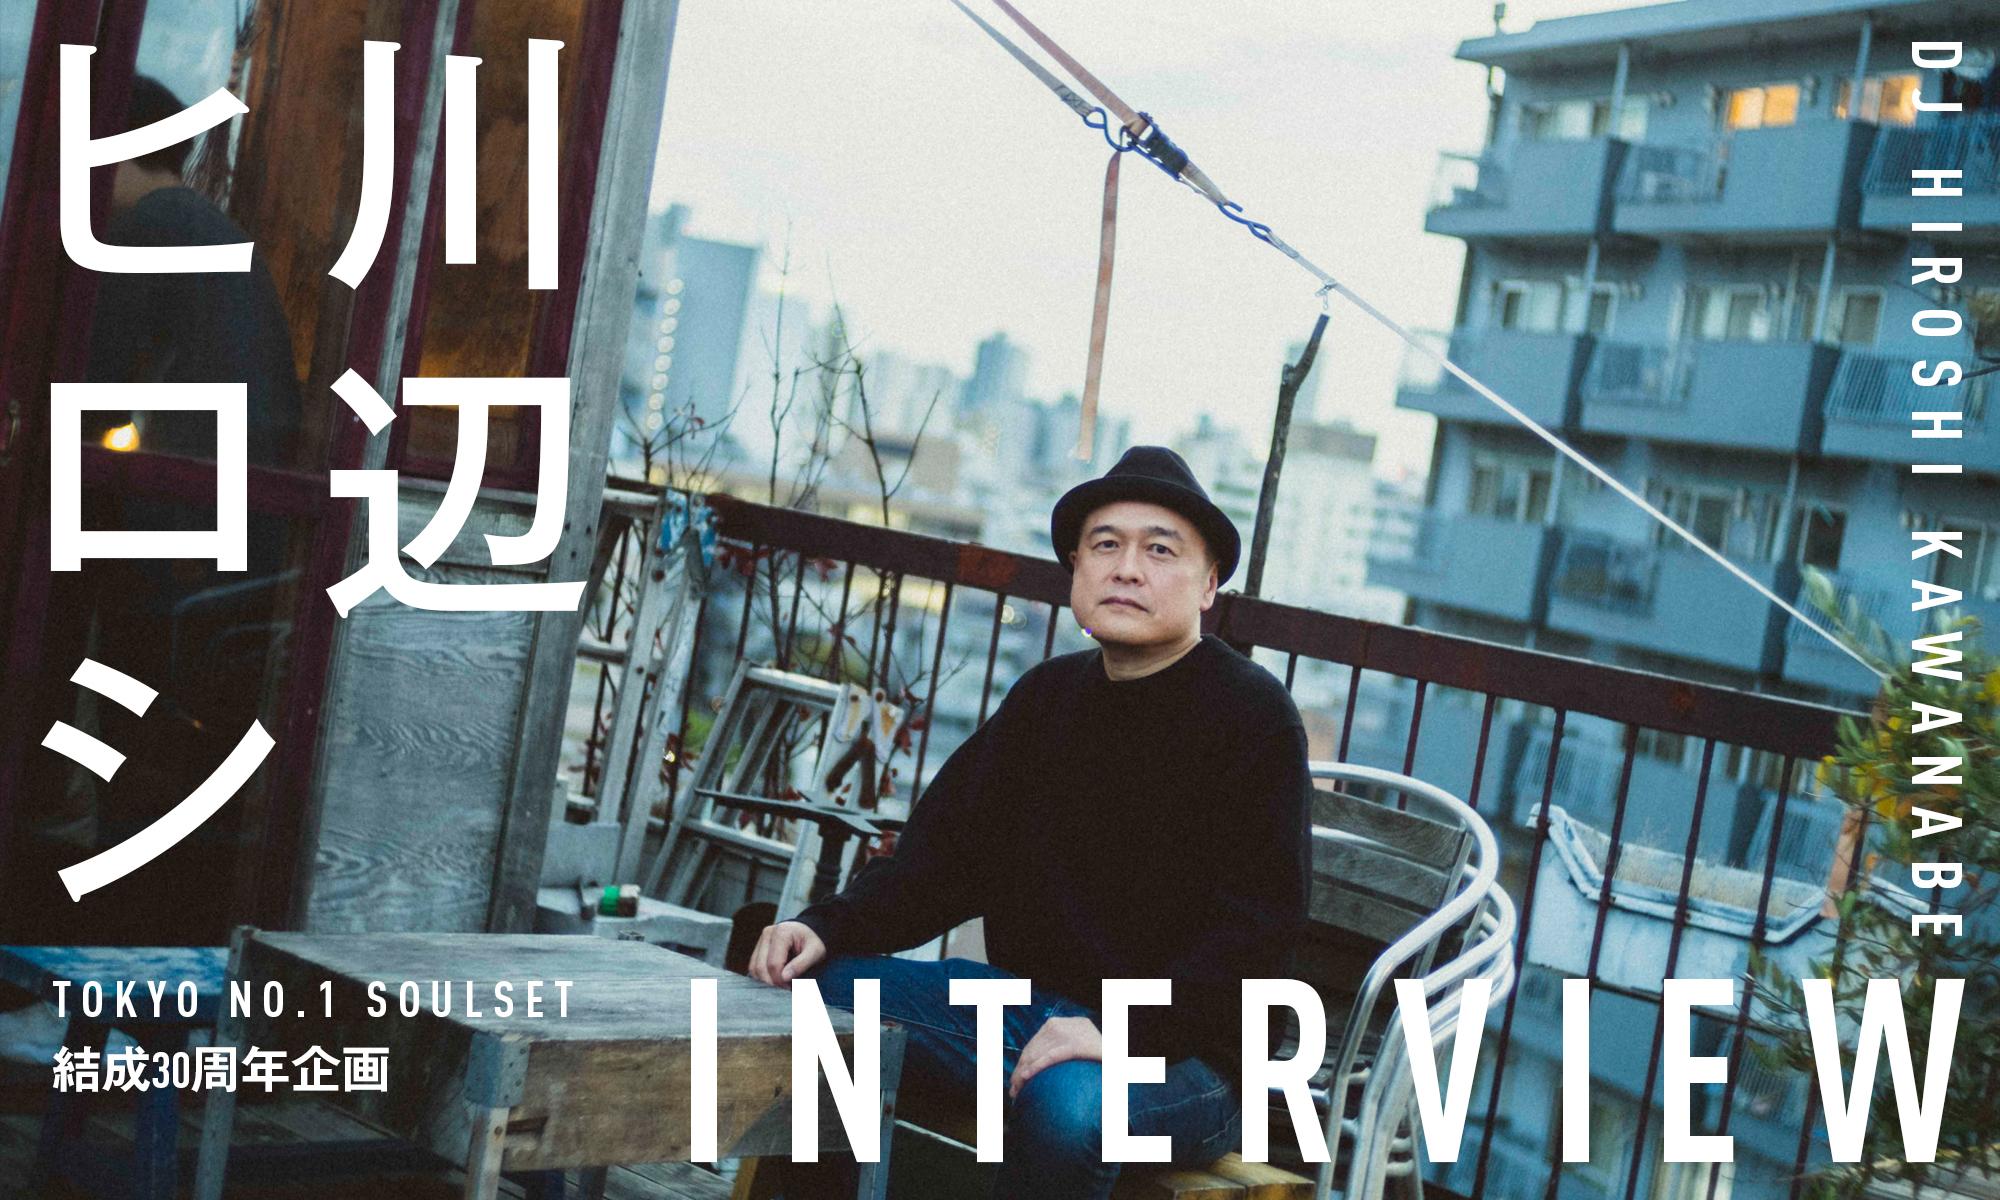 TOKYO NO.1 SOULSET結成30周年企画 DJ 川辺ヒロシ INTERVIEW